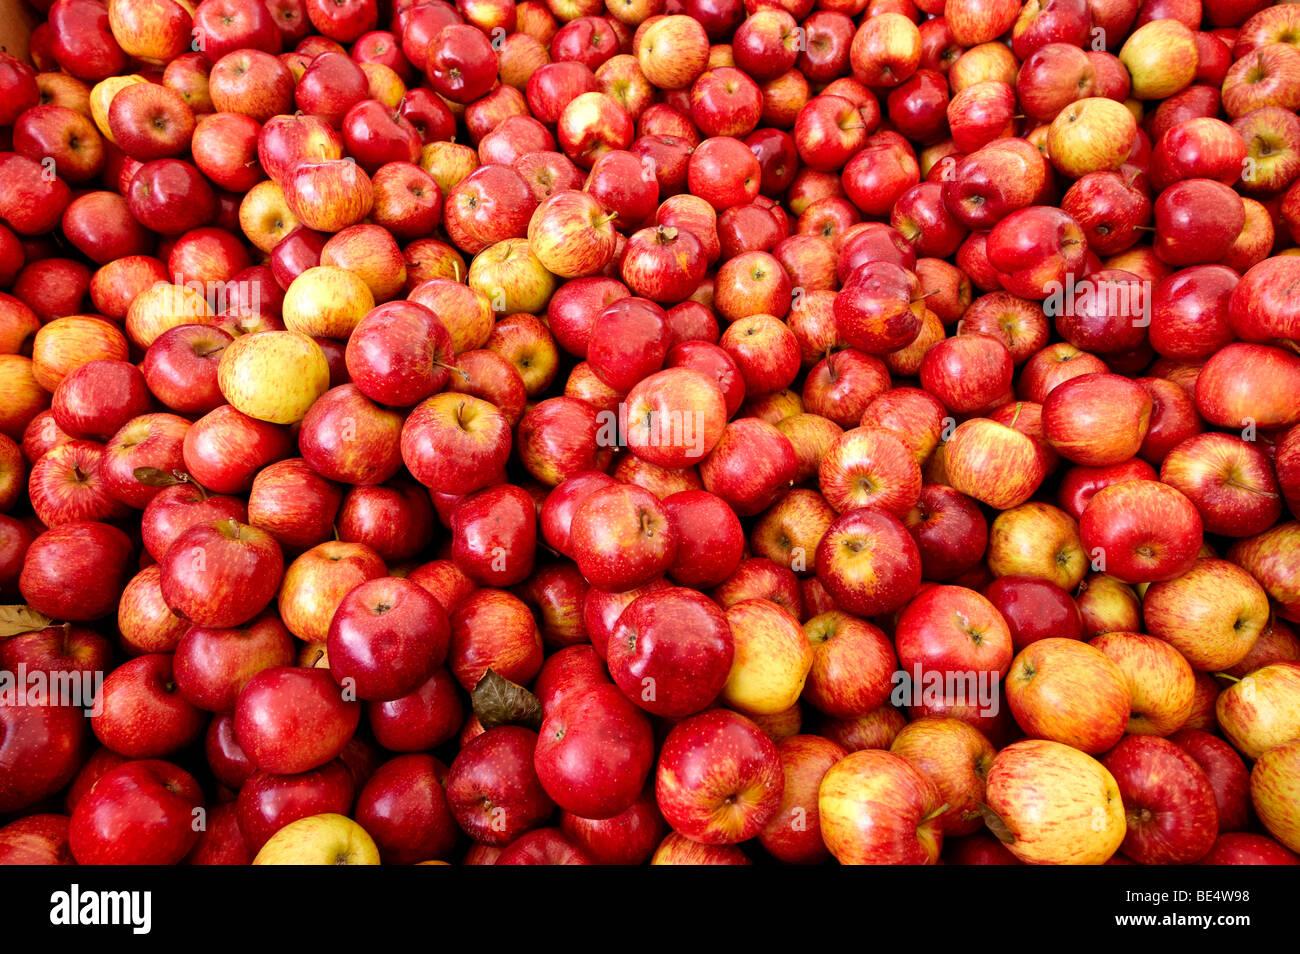 Fresh apples - Stock Image